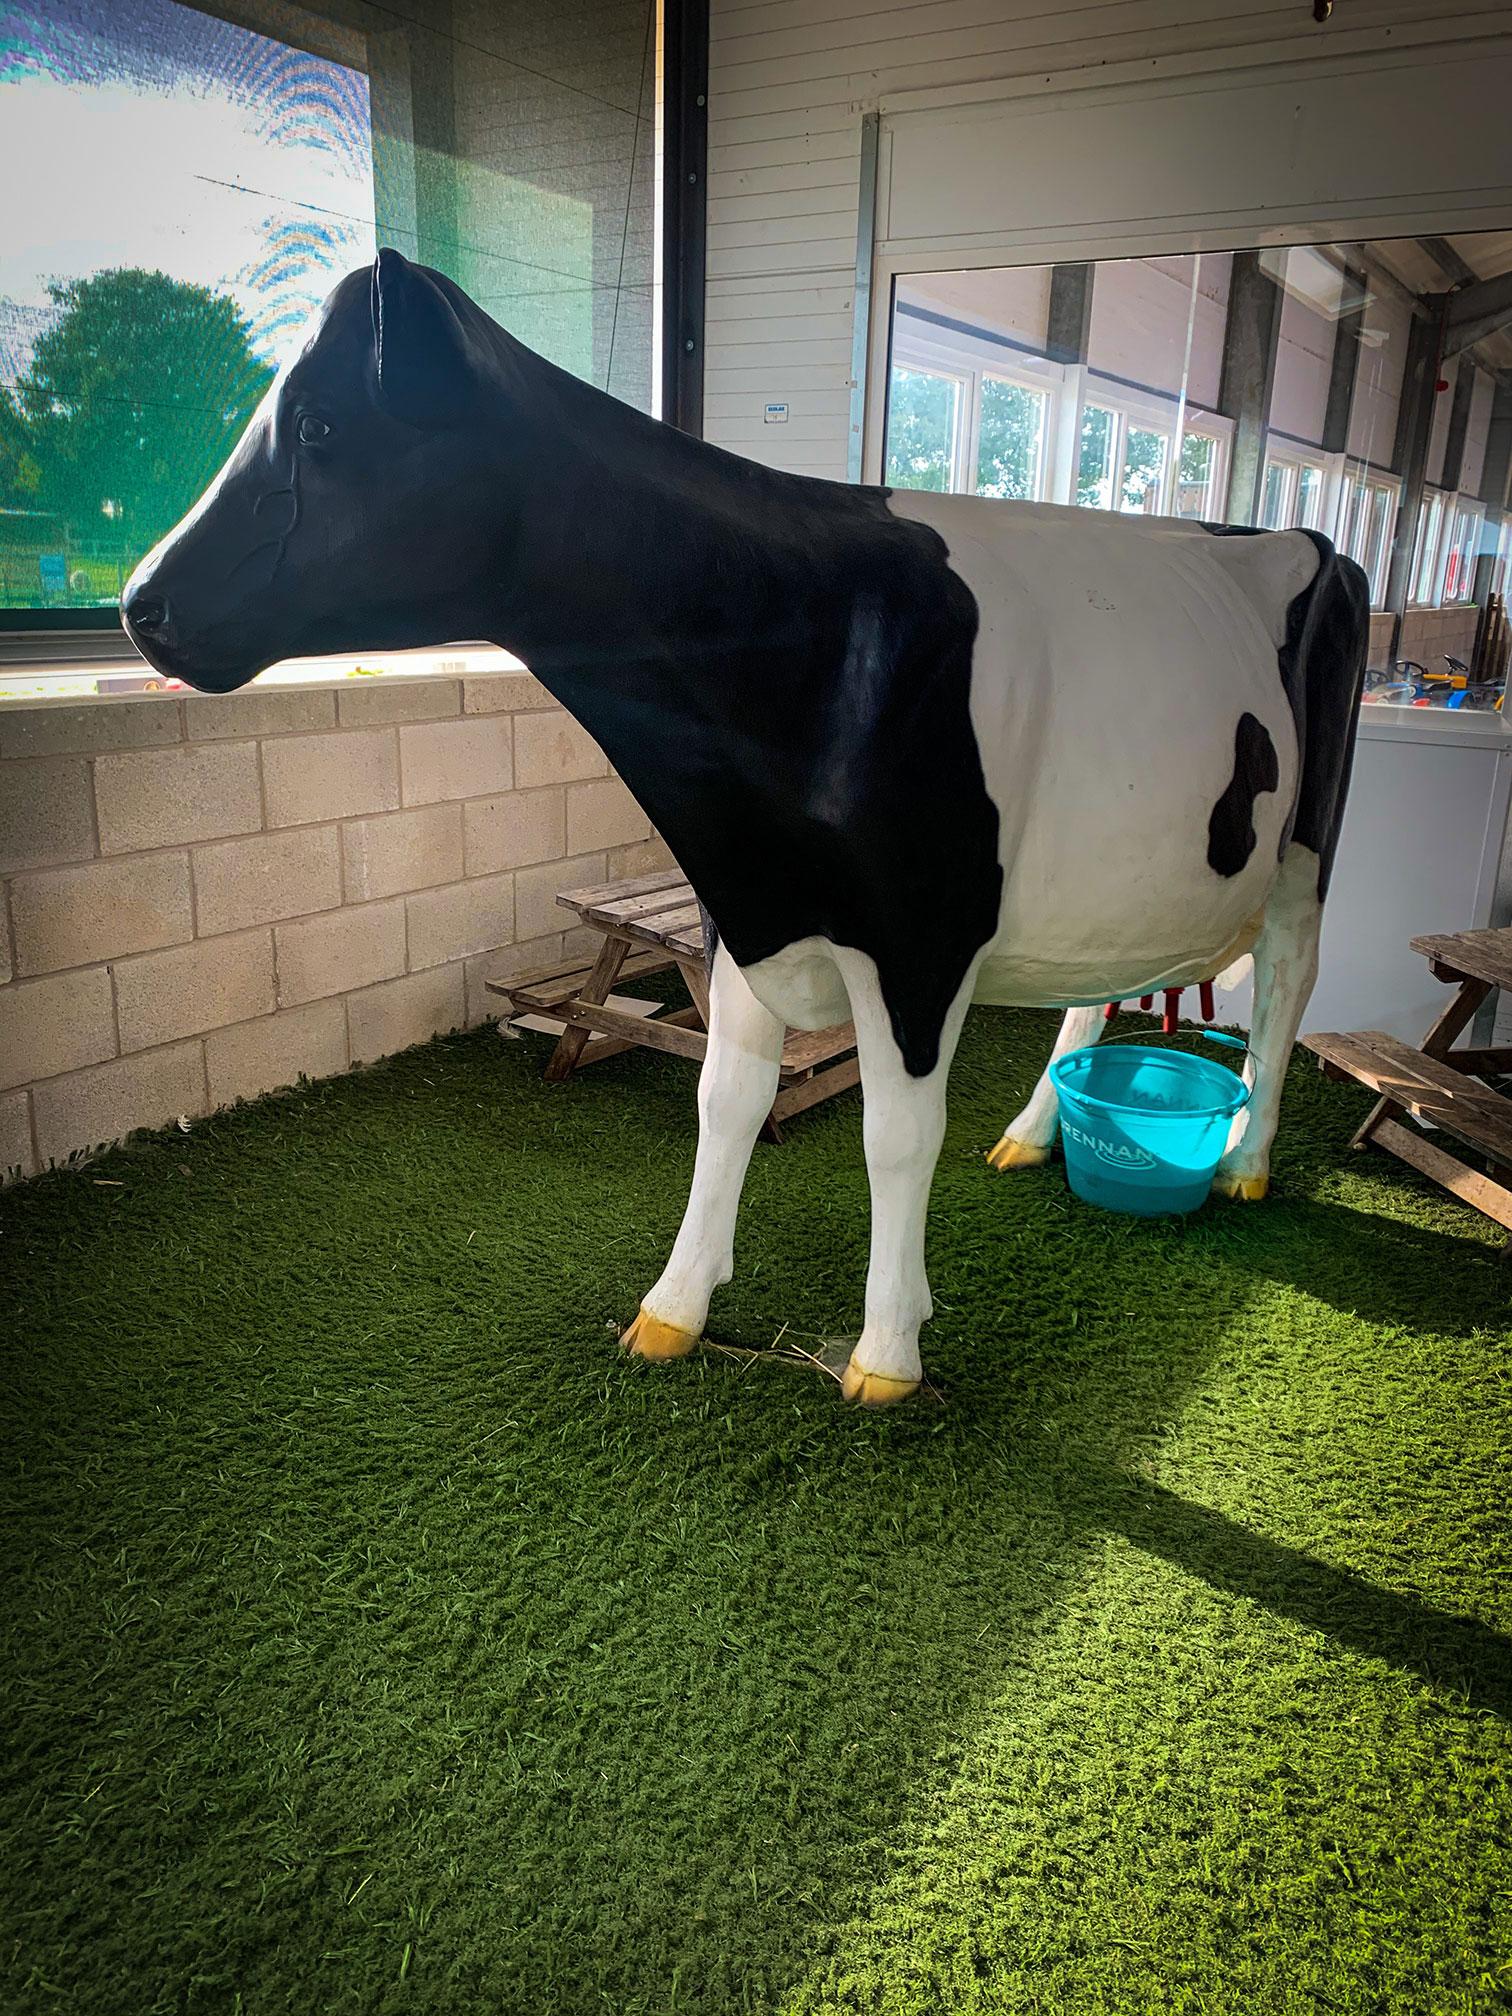 Mooana the Milking Cow